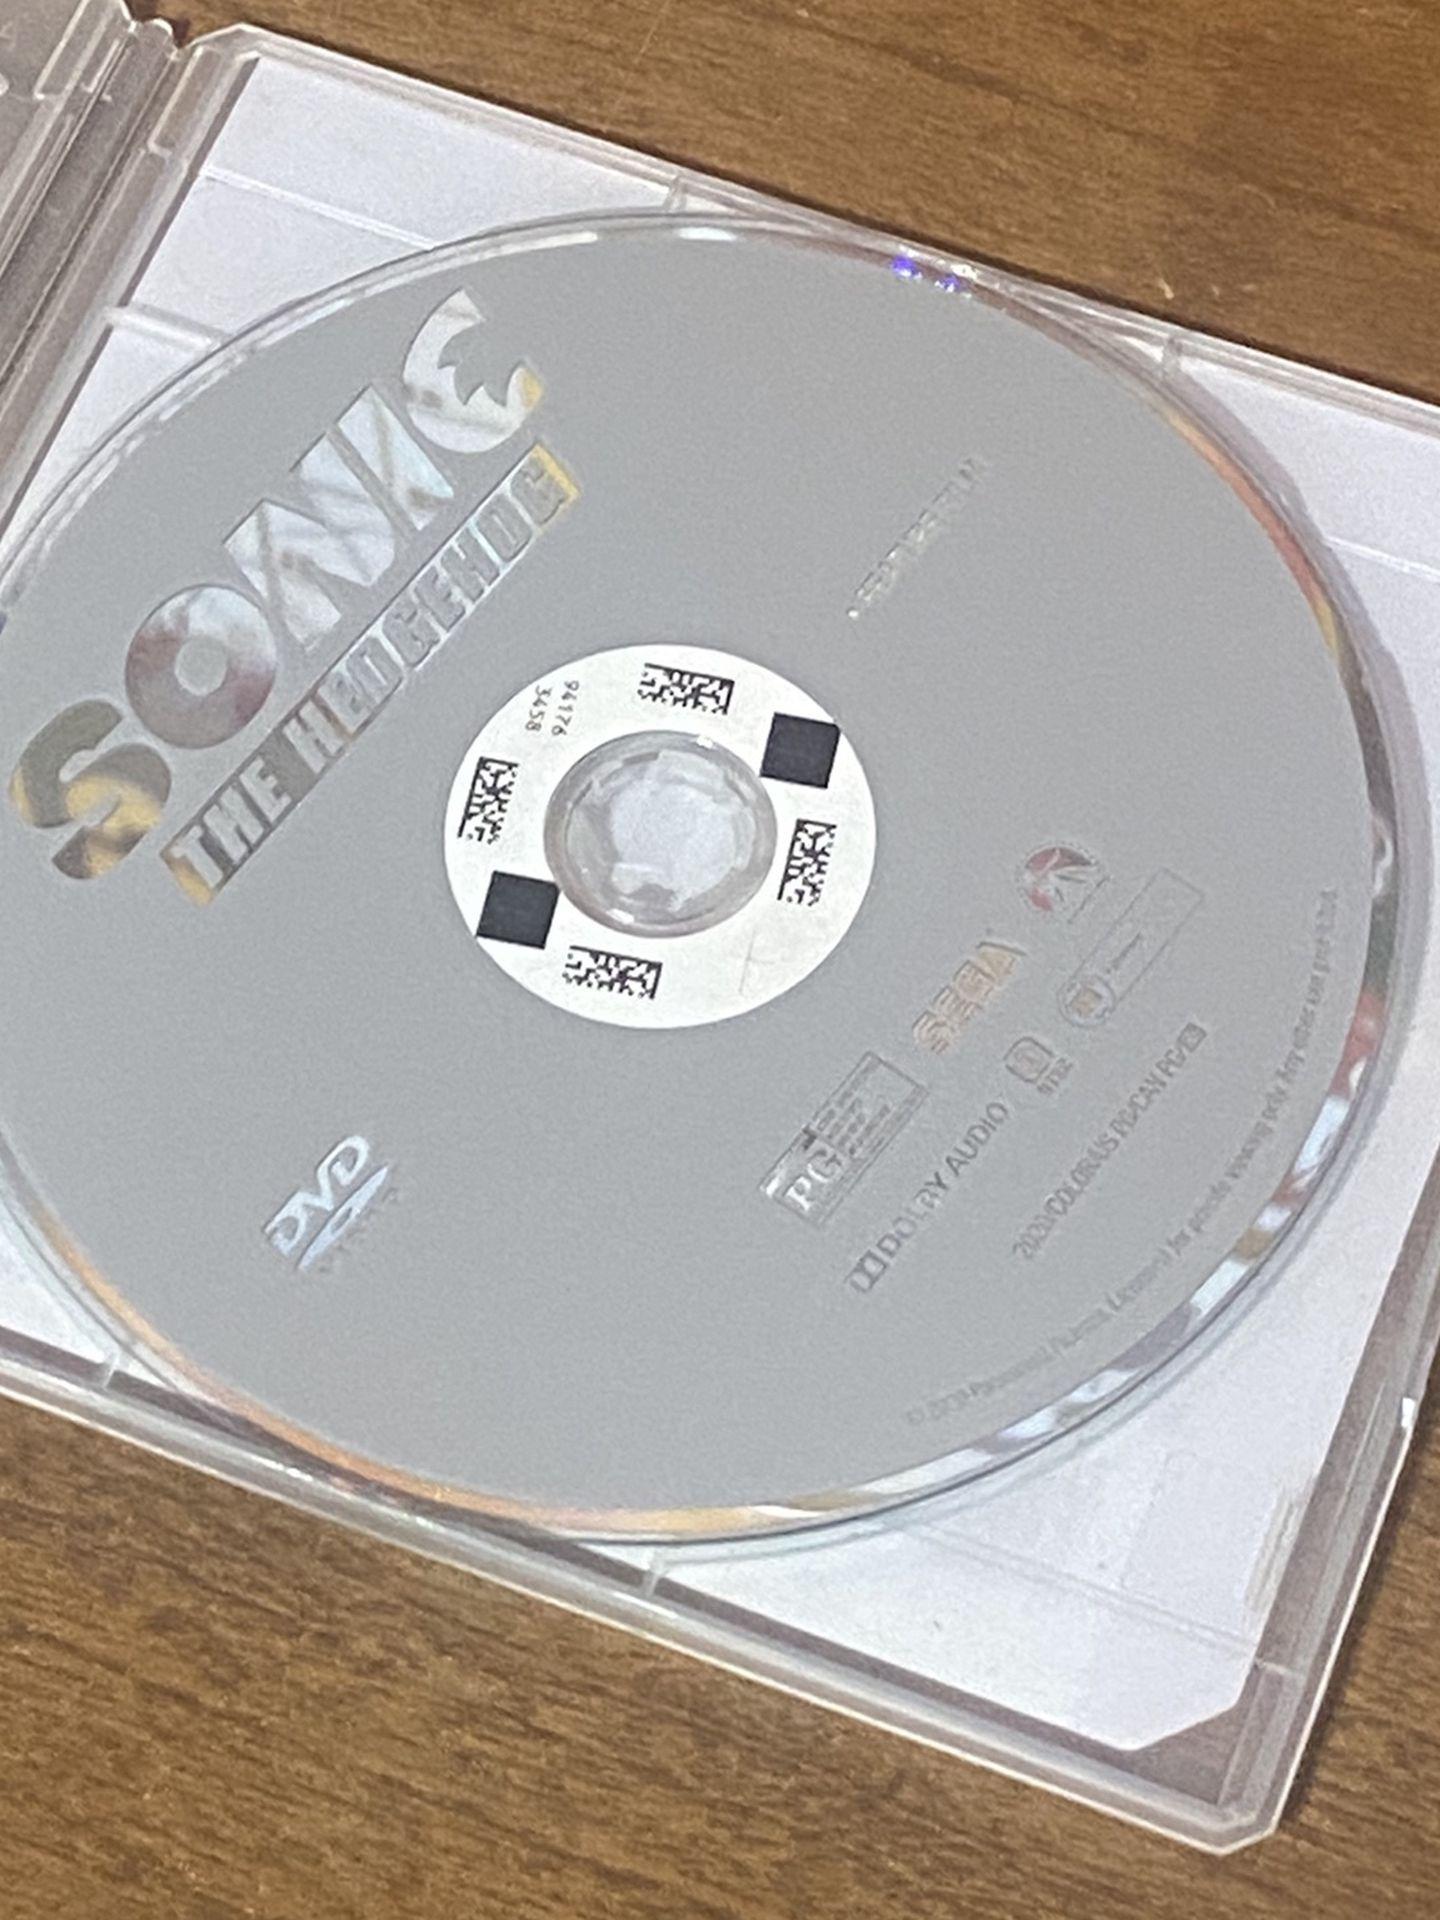 Sonic The Hedgehog DVD Blue Ray